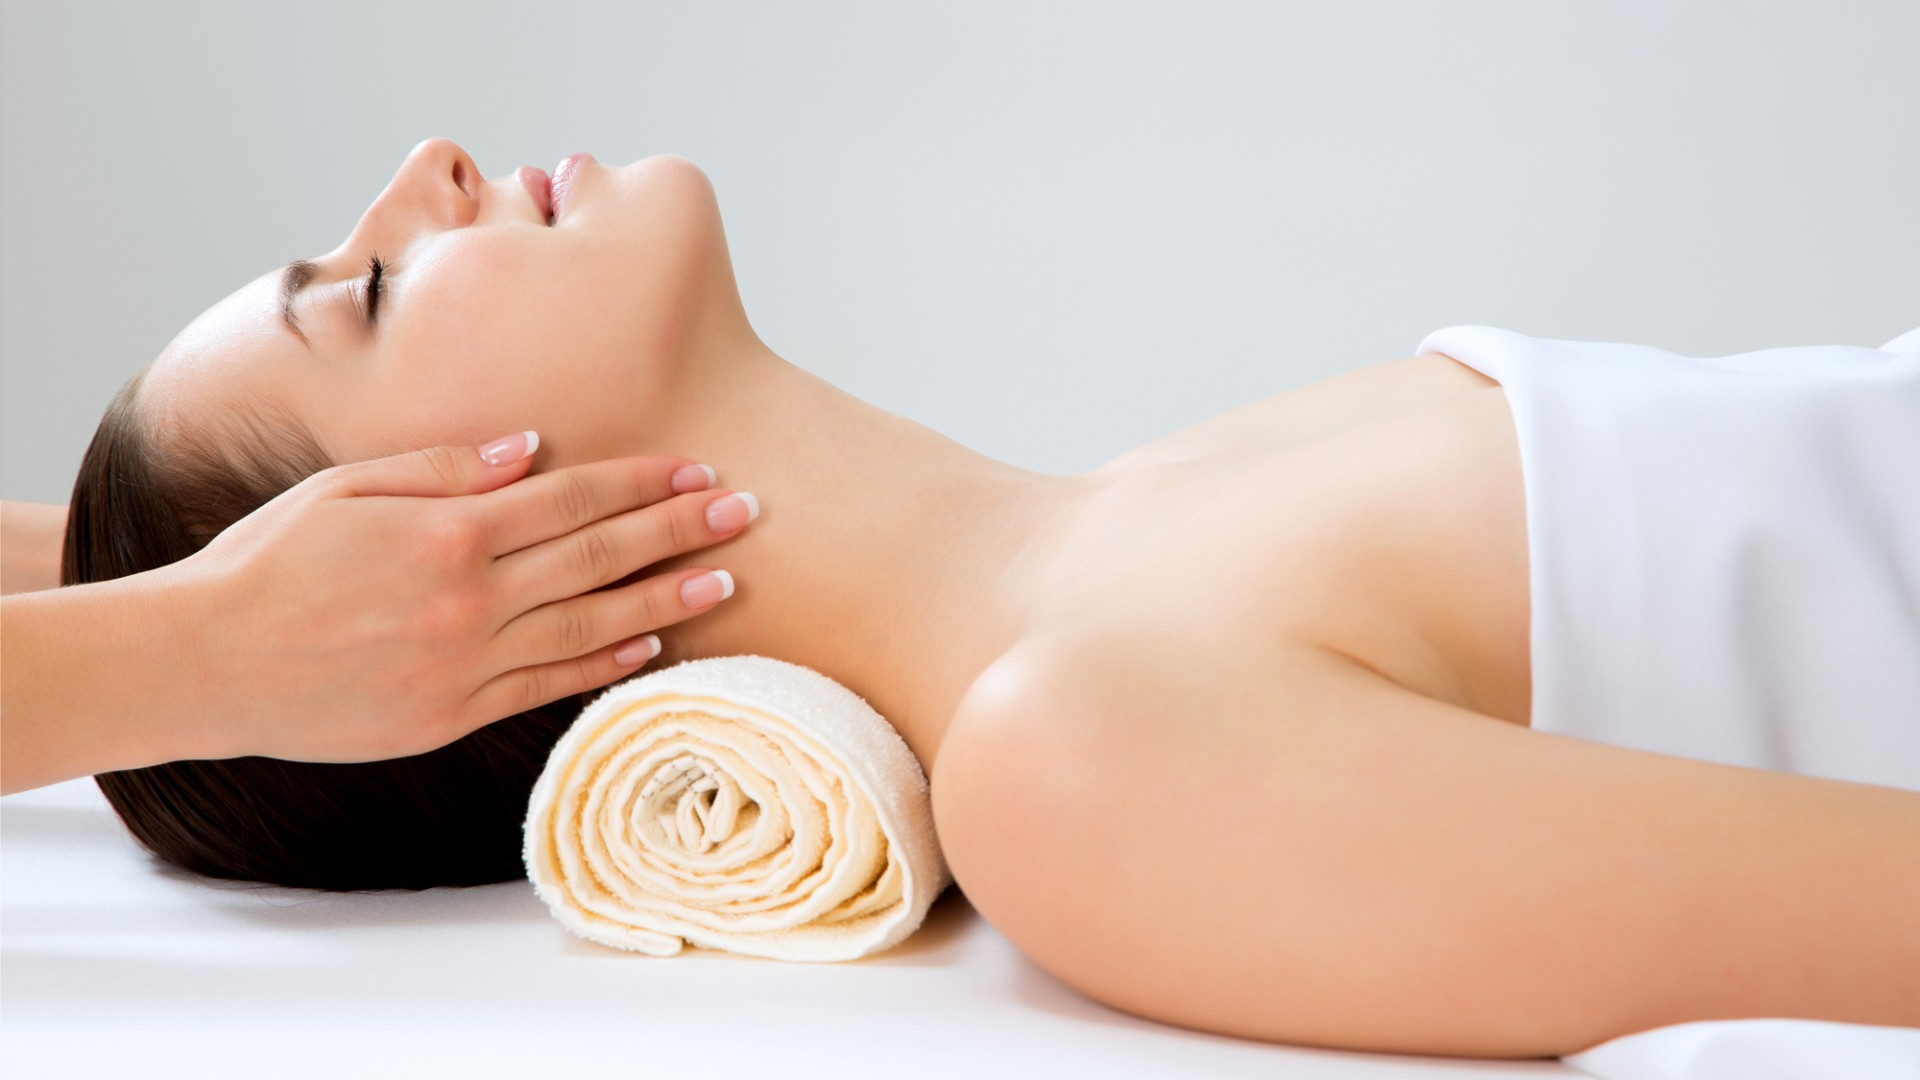 000 masaje relax relajacion balneario fisioterapia  (2)